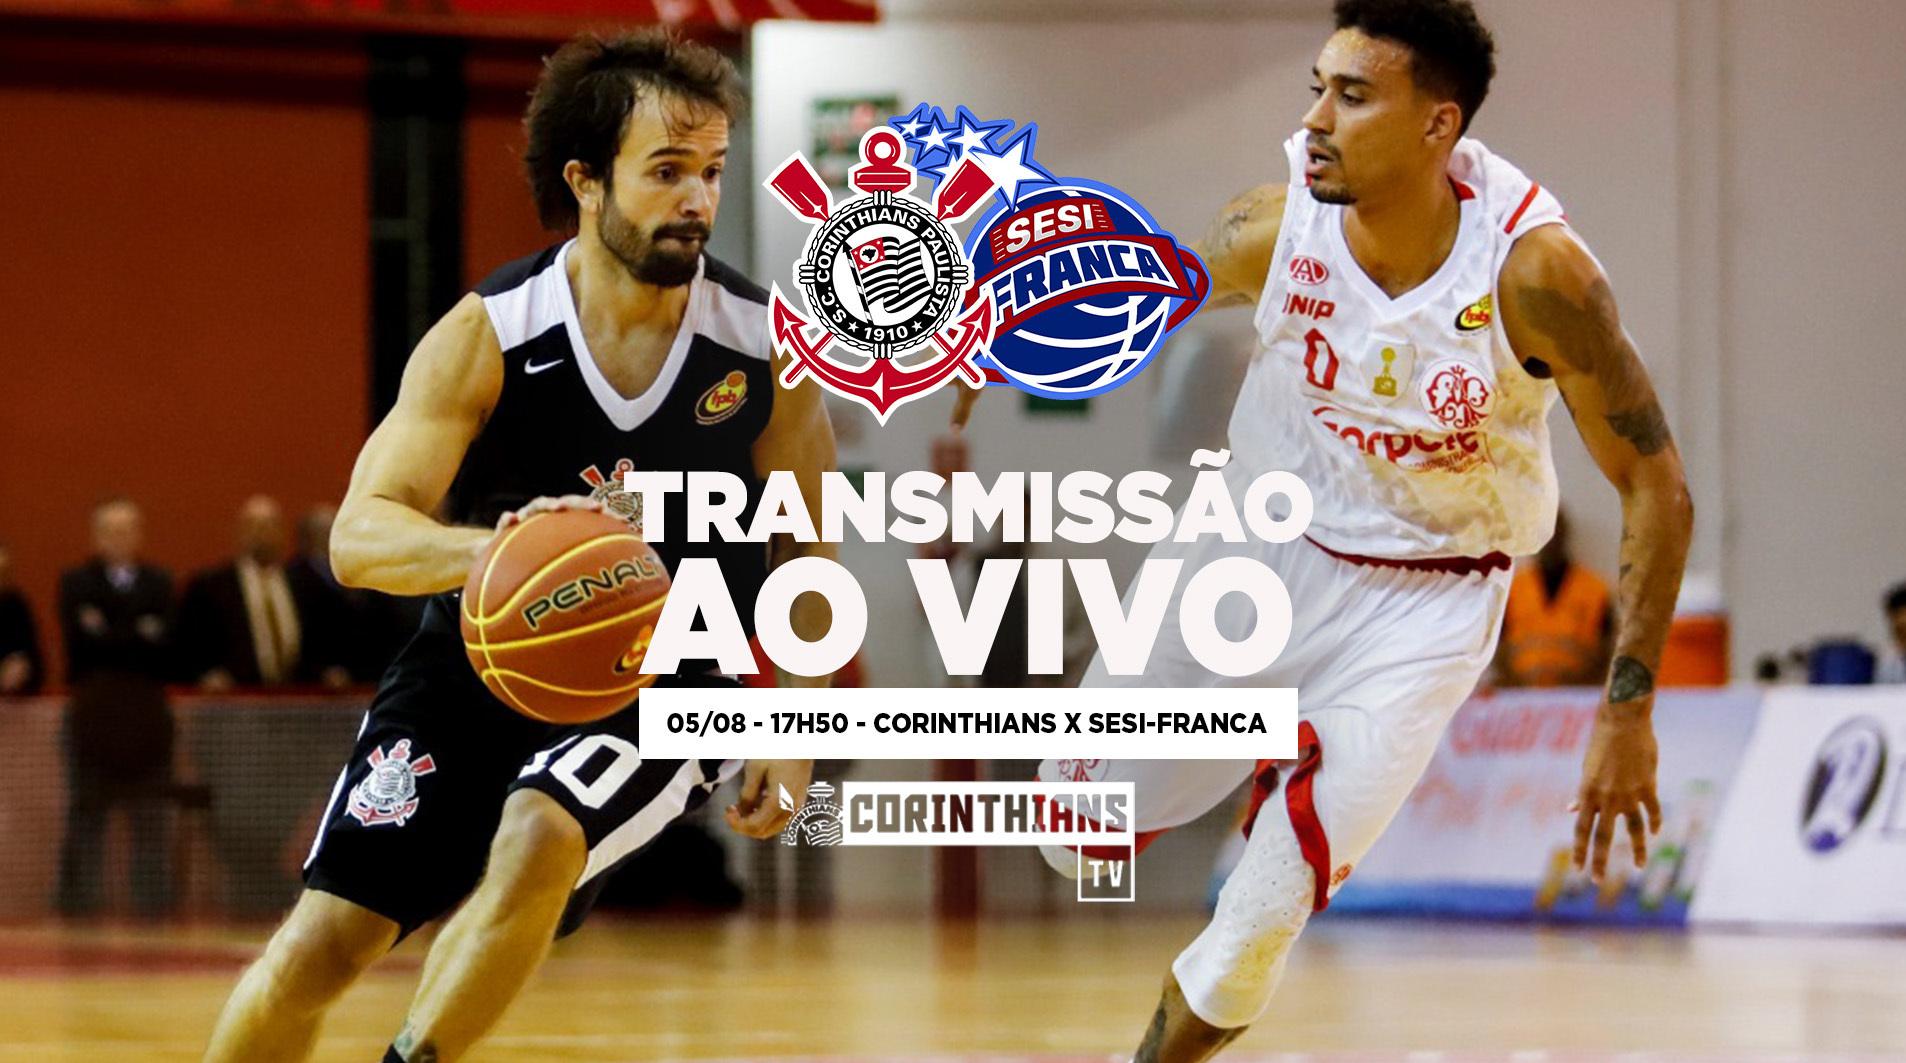 Corinthians x Franca - Campeonato Paulista de Basquete 2018